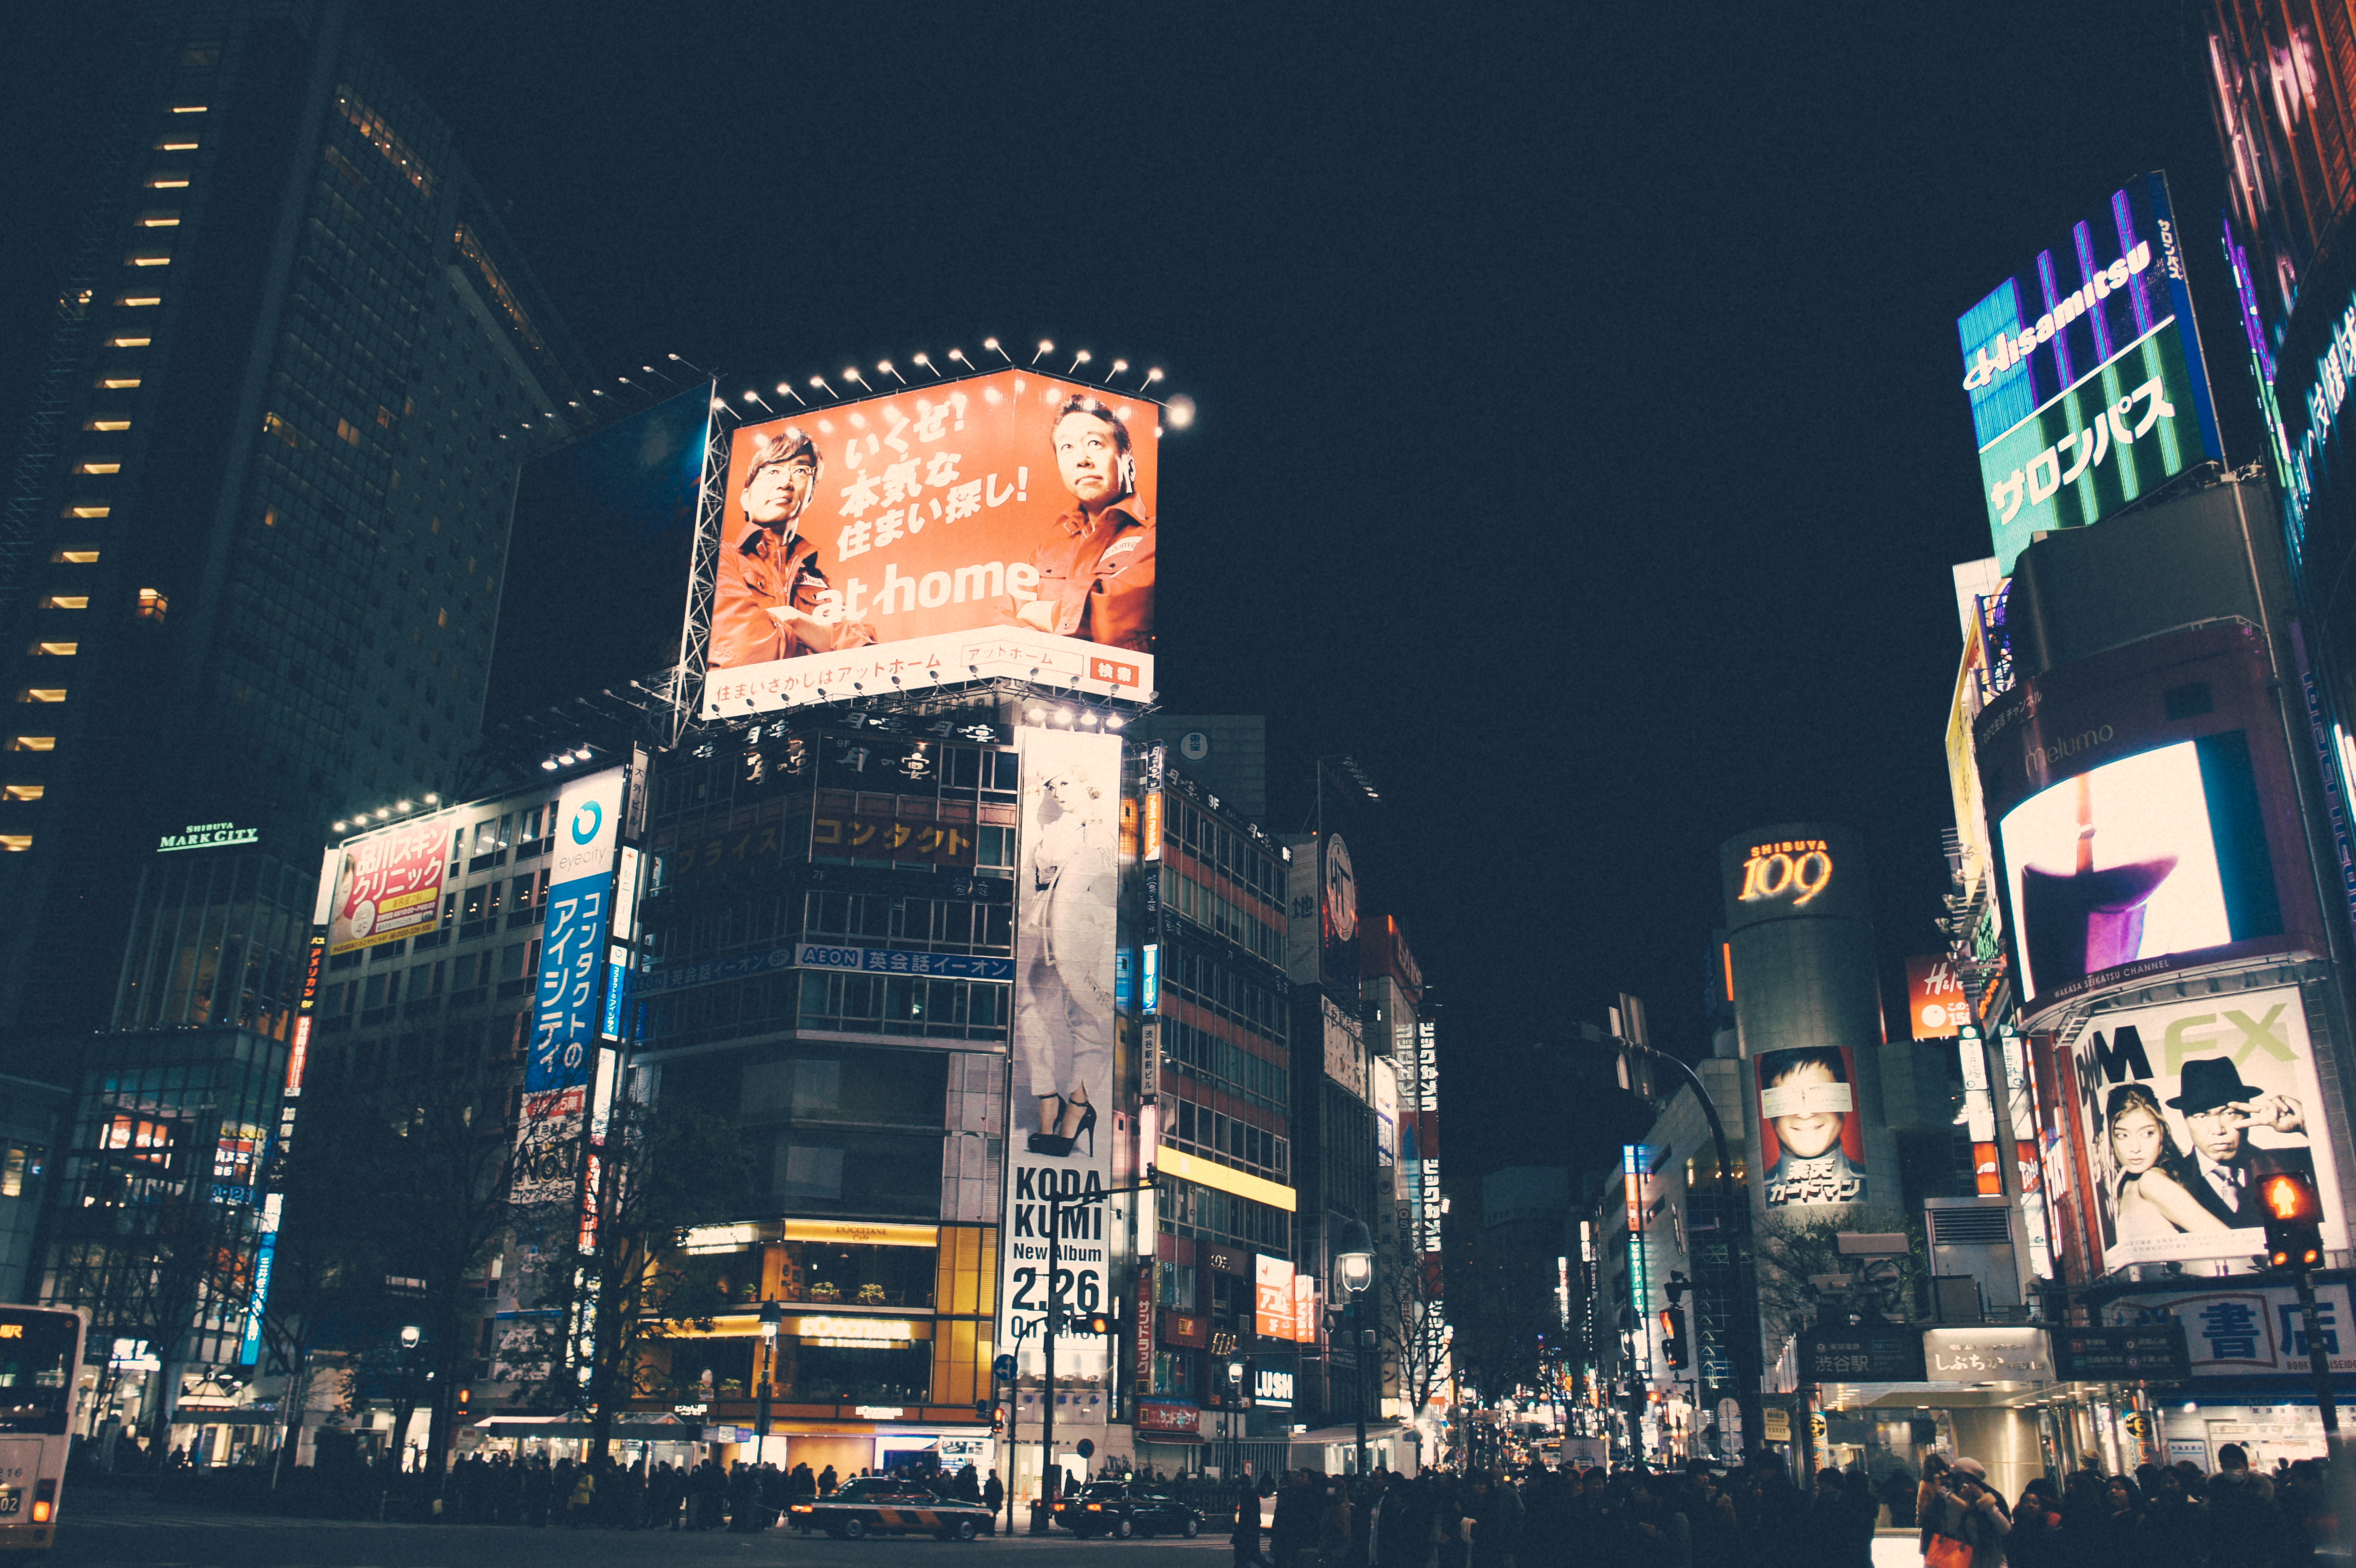 2015-09-Life-of-Pix-free-stock-photos-city-light-advertising-Akappuru